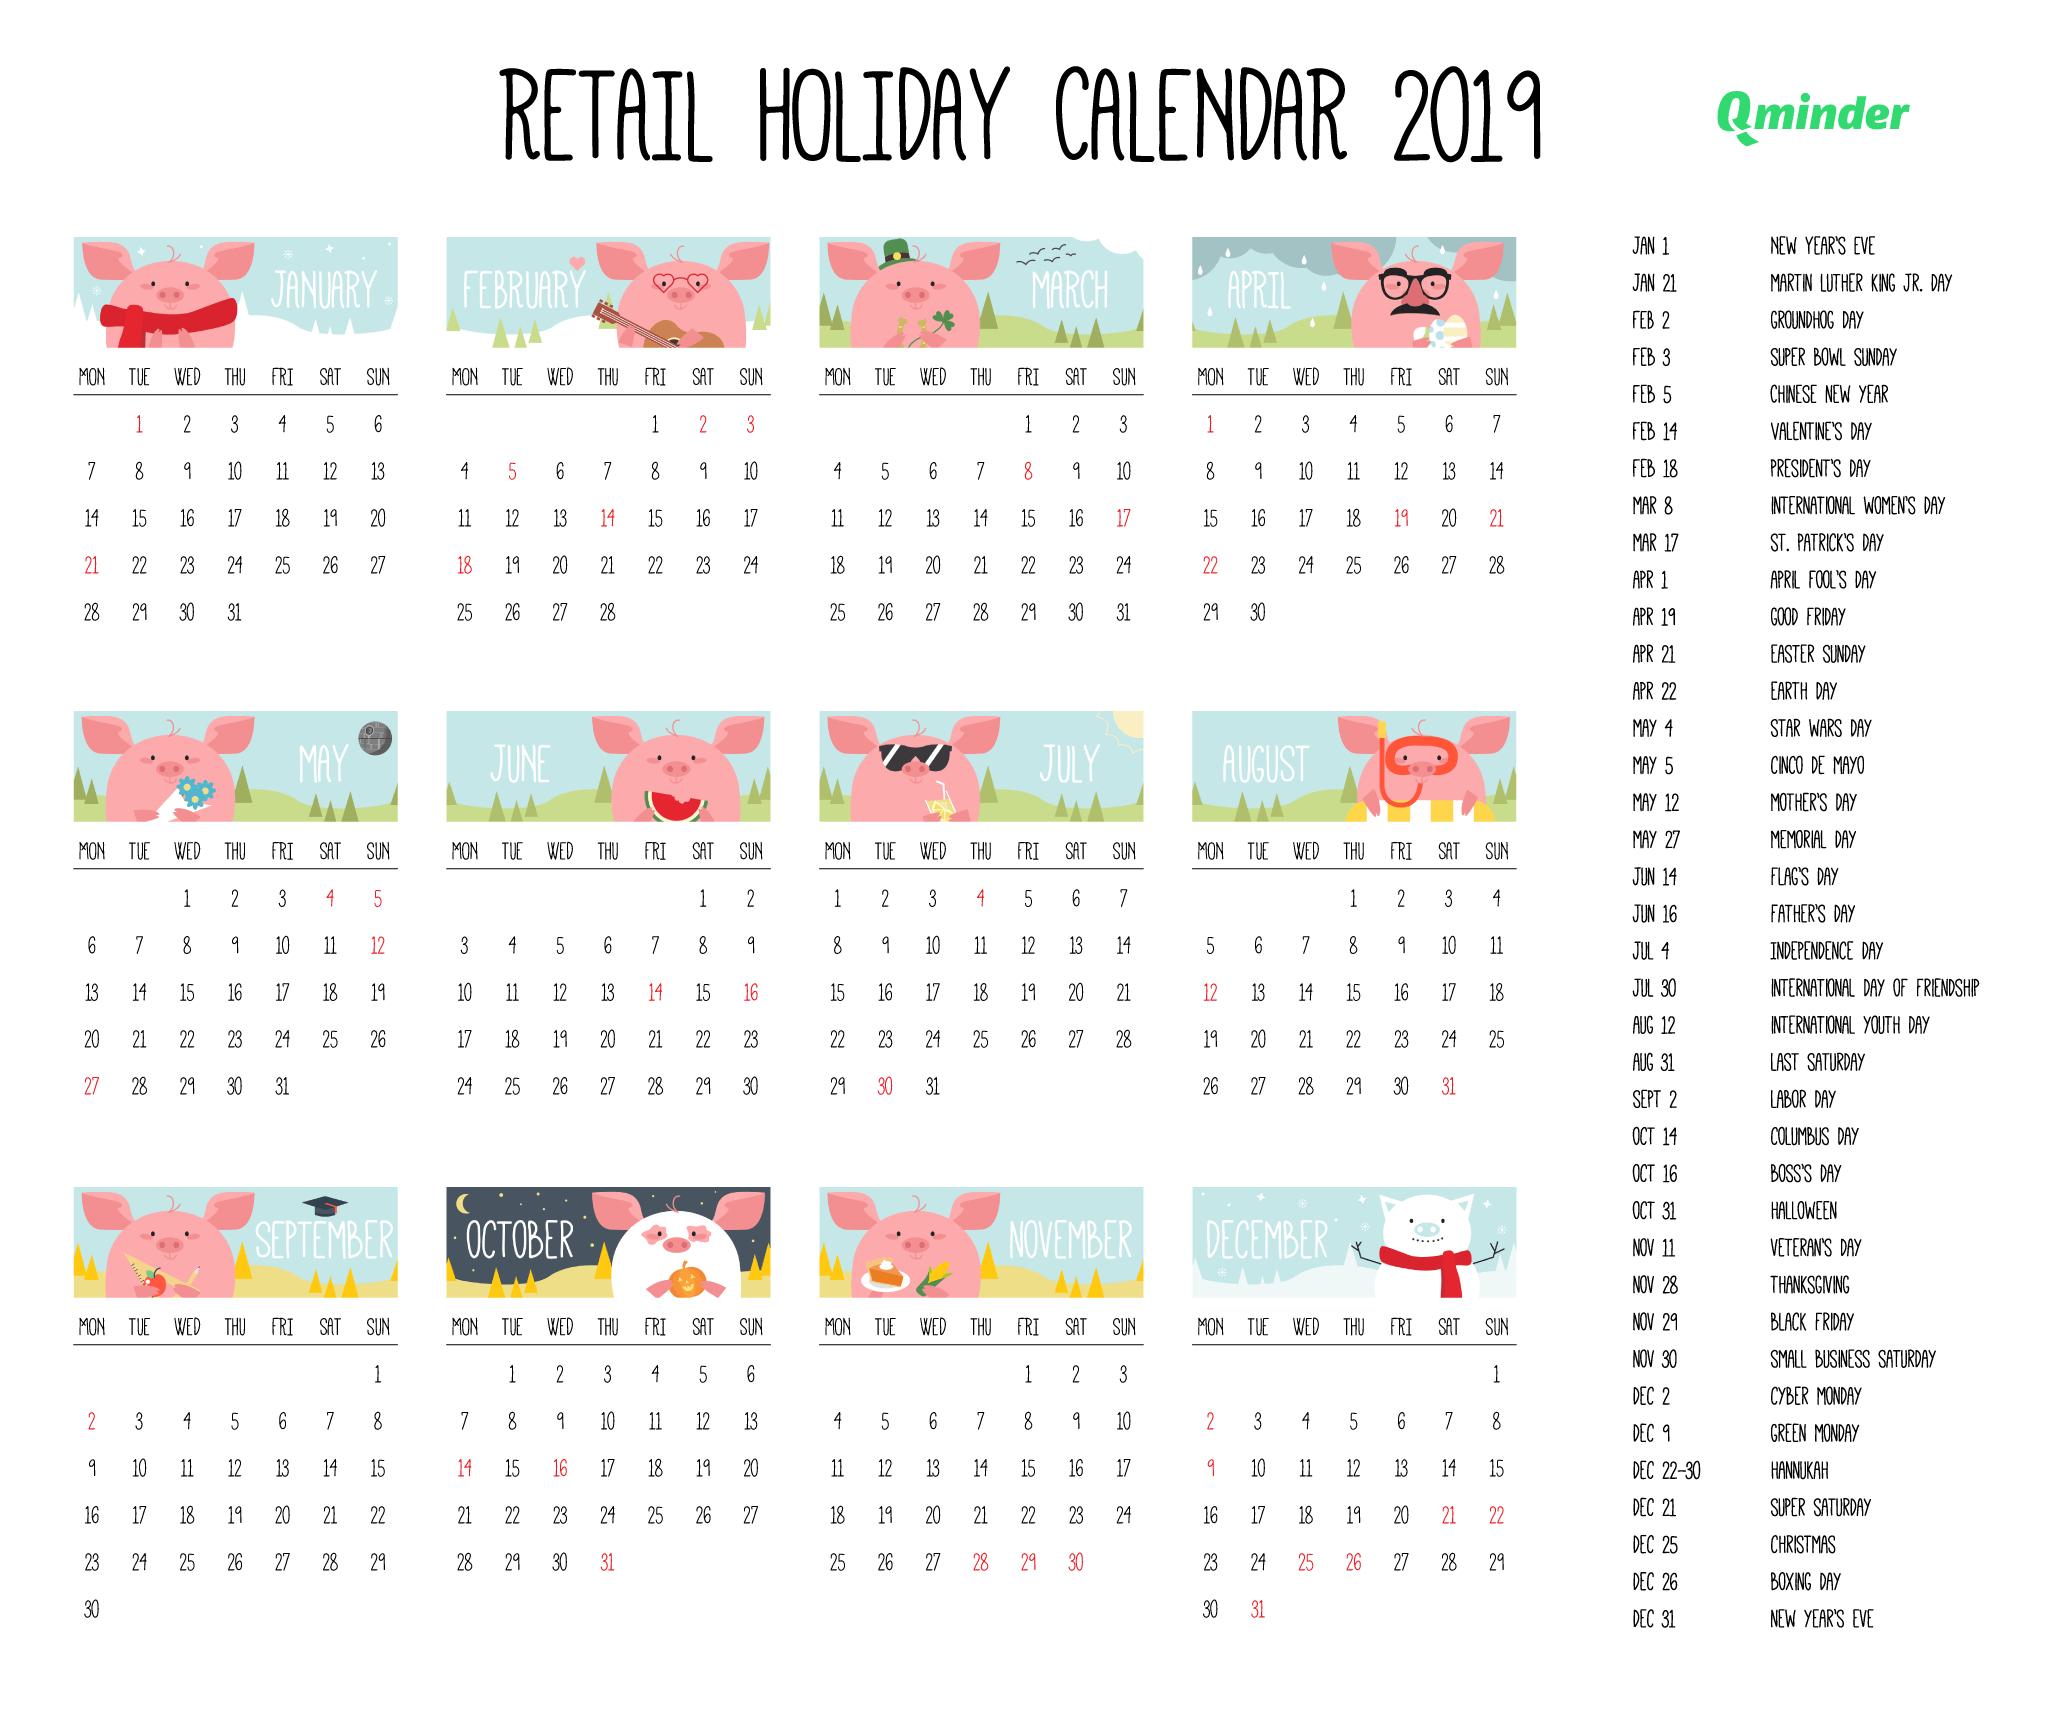 2019 Retail Holiday Calendar | Qminder Holidays On A Calendar 2019